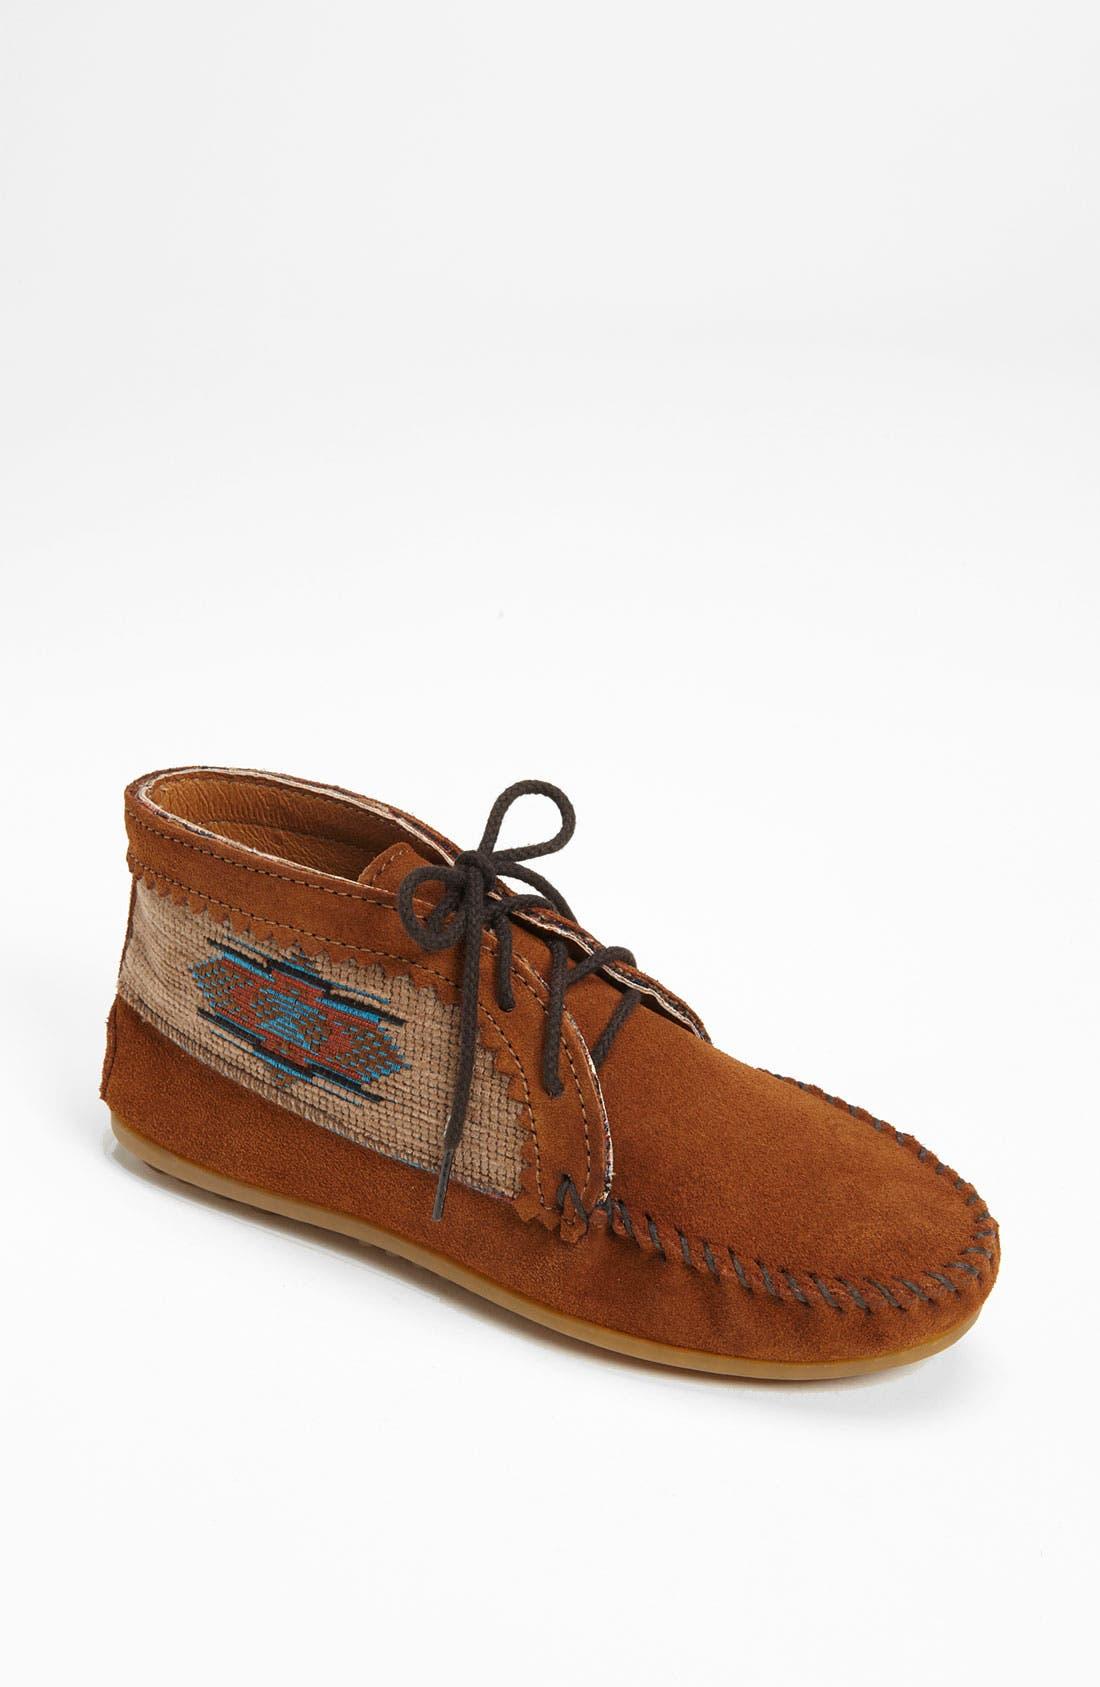 'El Paso' Ankle Boot,                             Main thumbnail 1, color,                             211